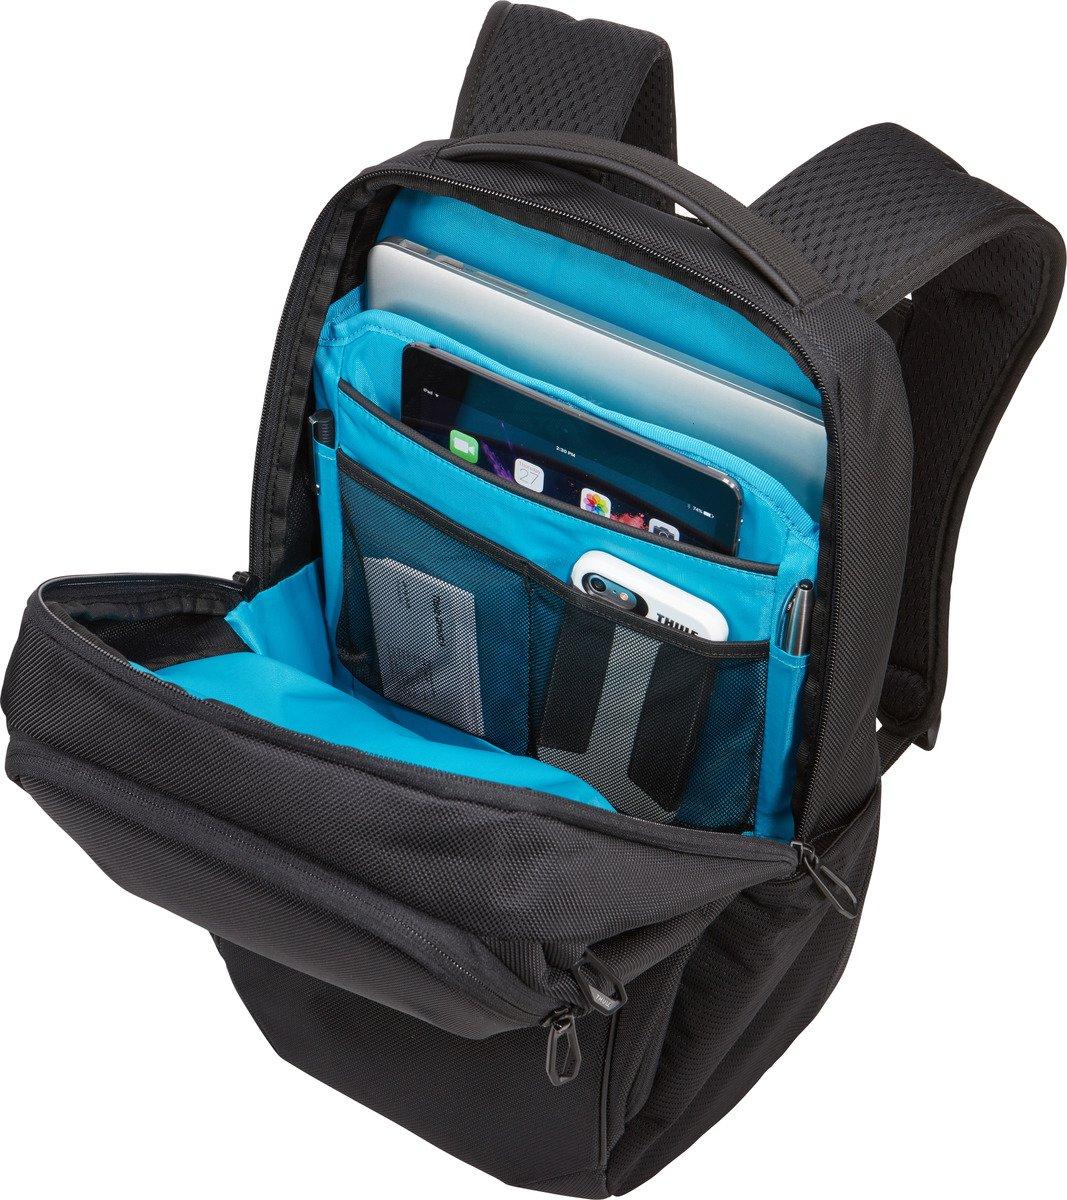 Plecak Thule Accent 23L na Laptopa do 15,6 czarny